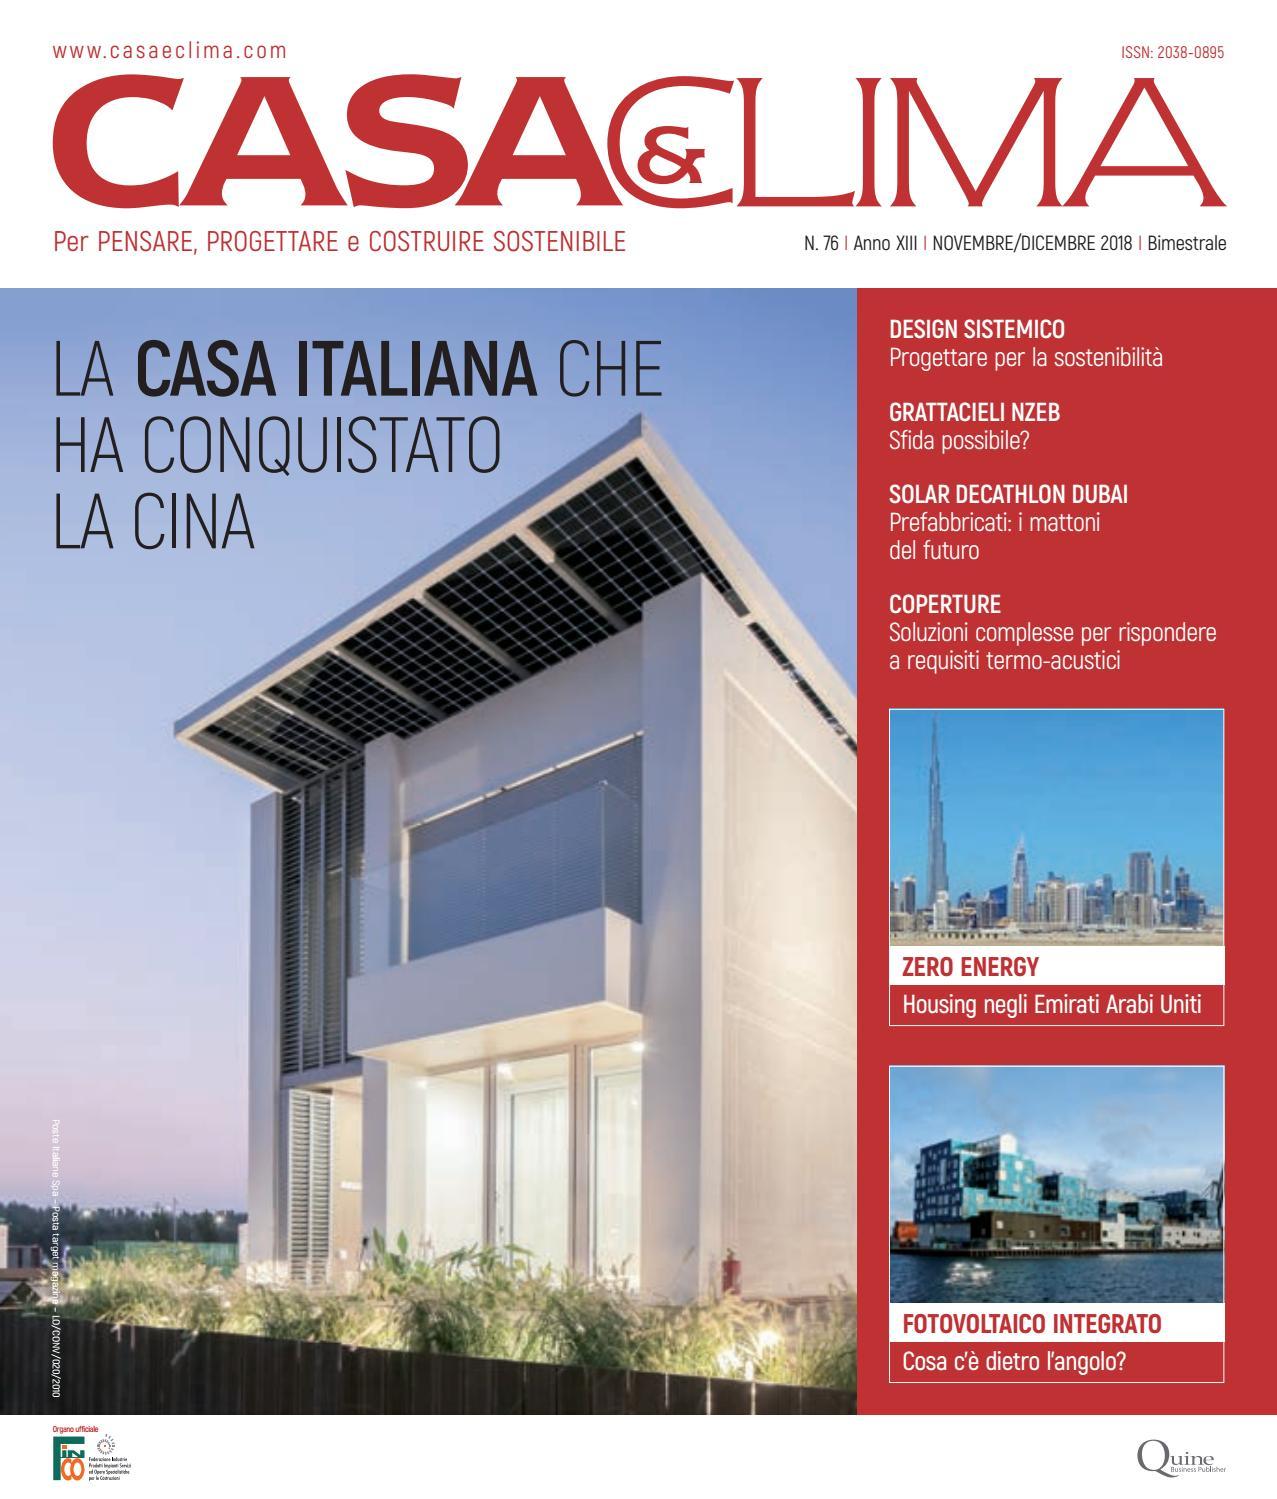 Serra Bioclimatica Normativa Lombardia casa&clima #76 by quine business publisher - issuu